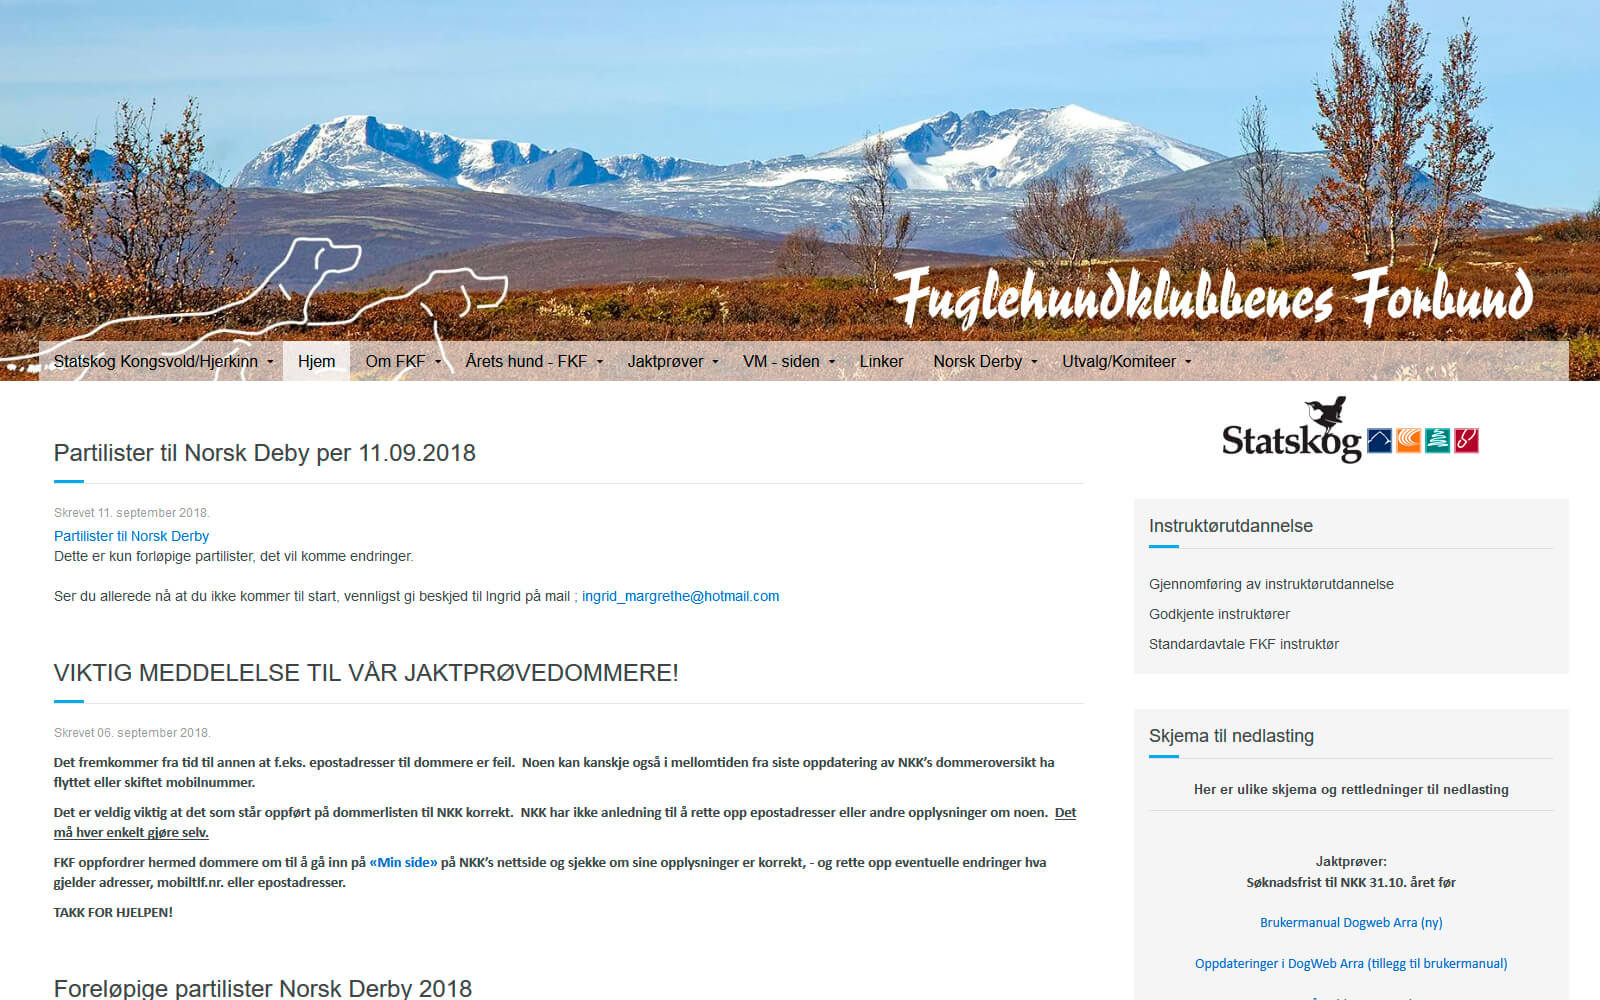 Fuglehundklubbenes forbund webside